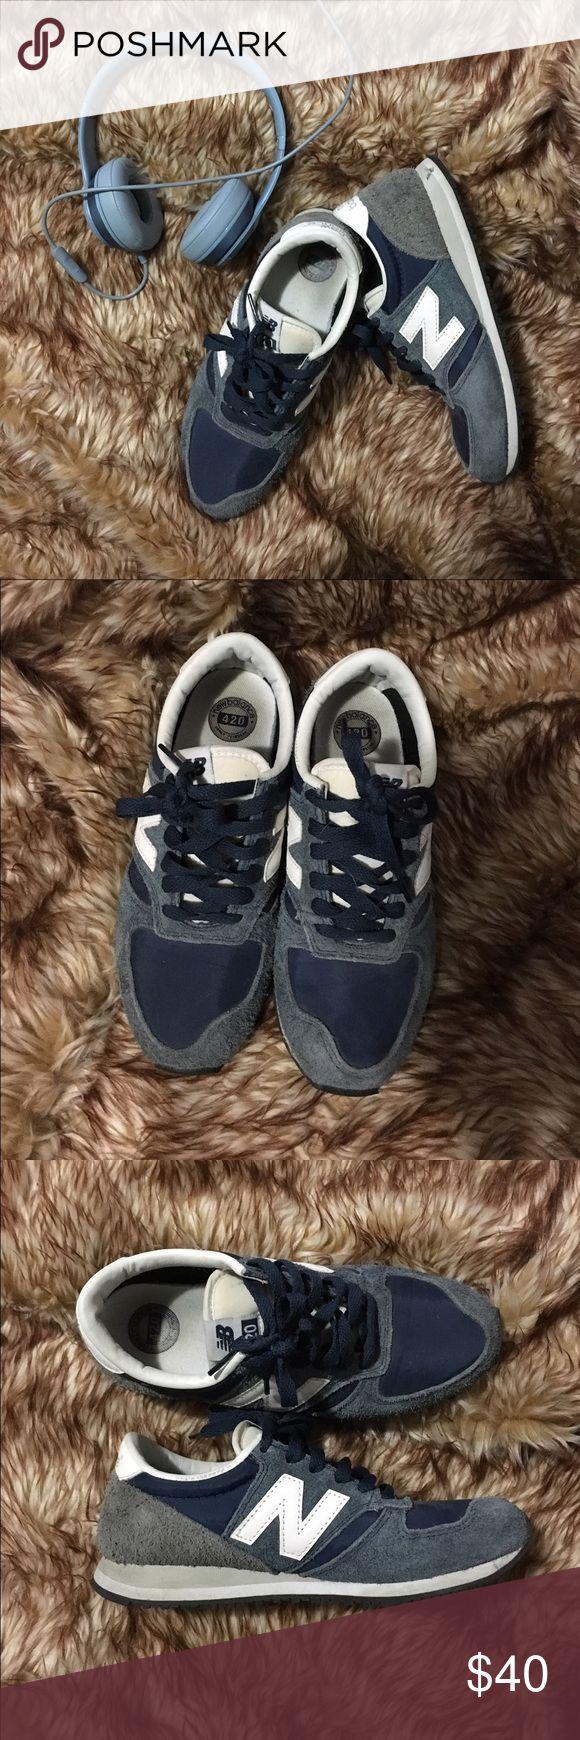 shoes similar to new balance 420